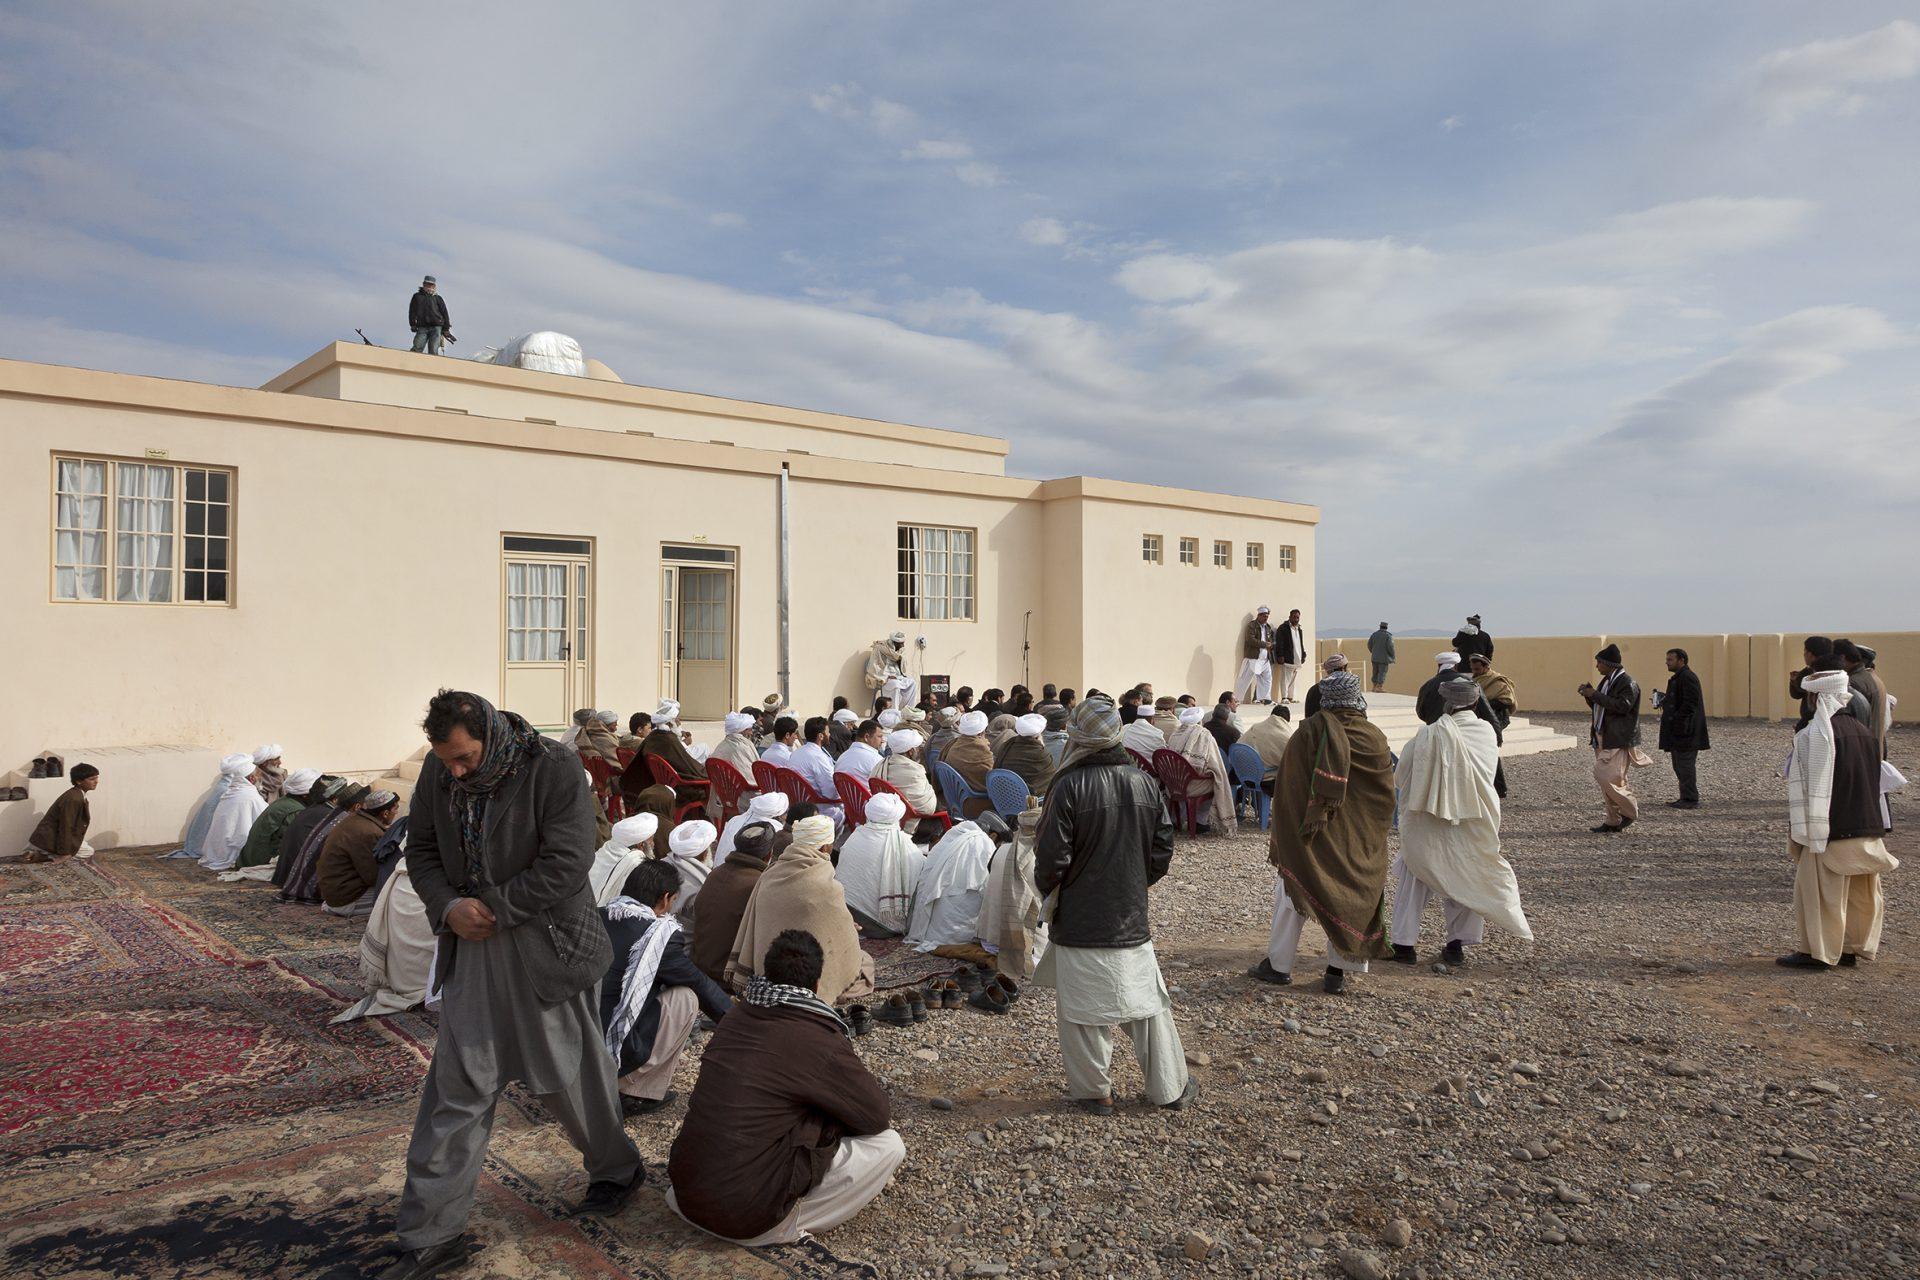 Einweihungsfeier in Afghanistan. Cap Anamur-Krankenhaus in Shade.